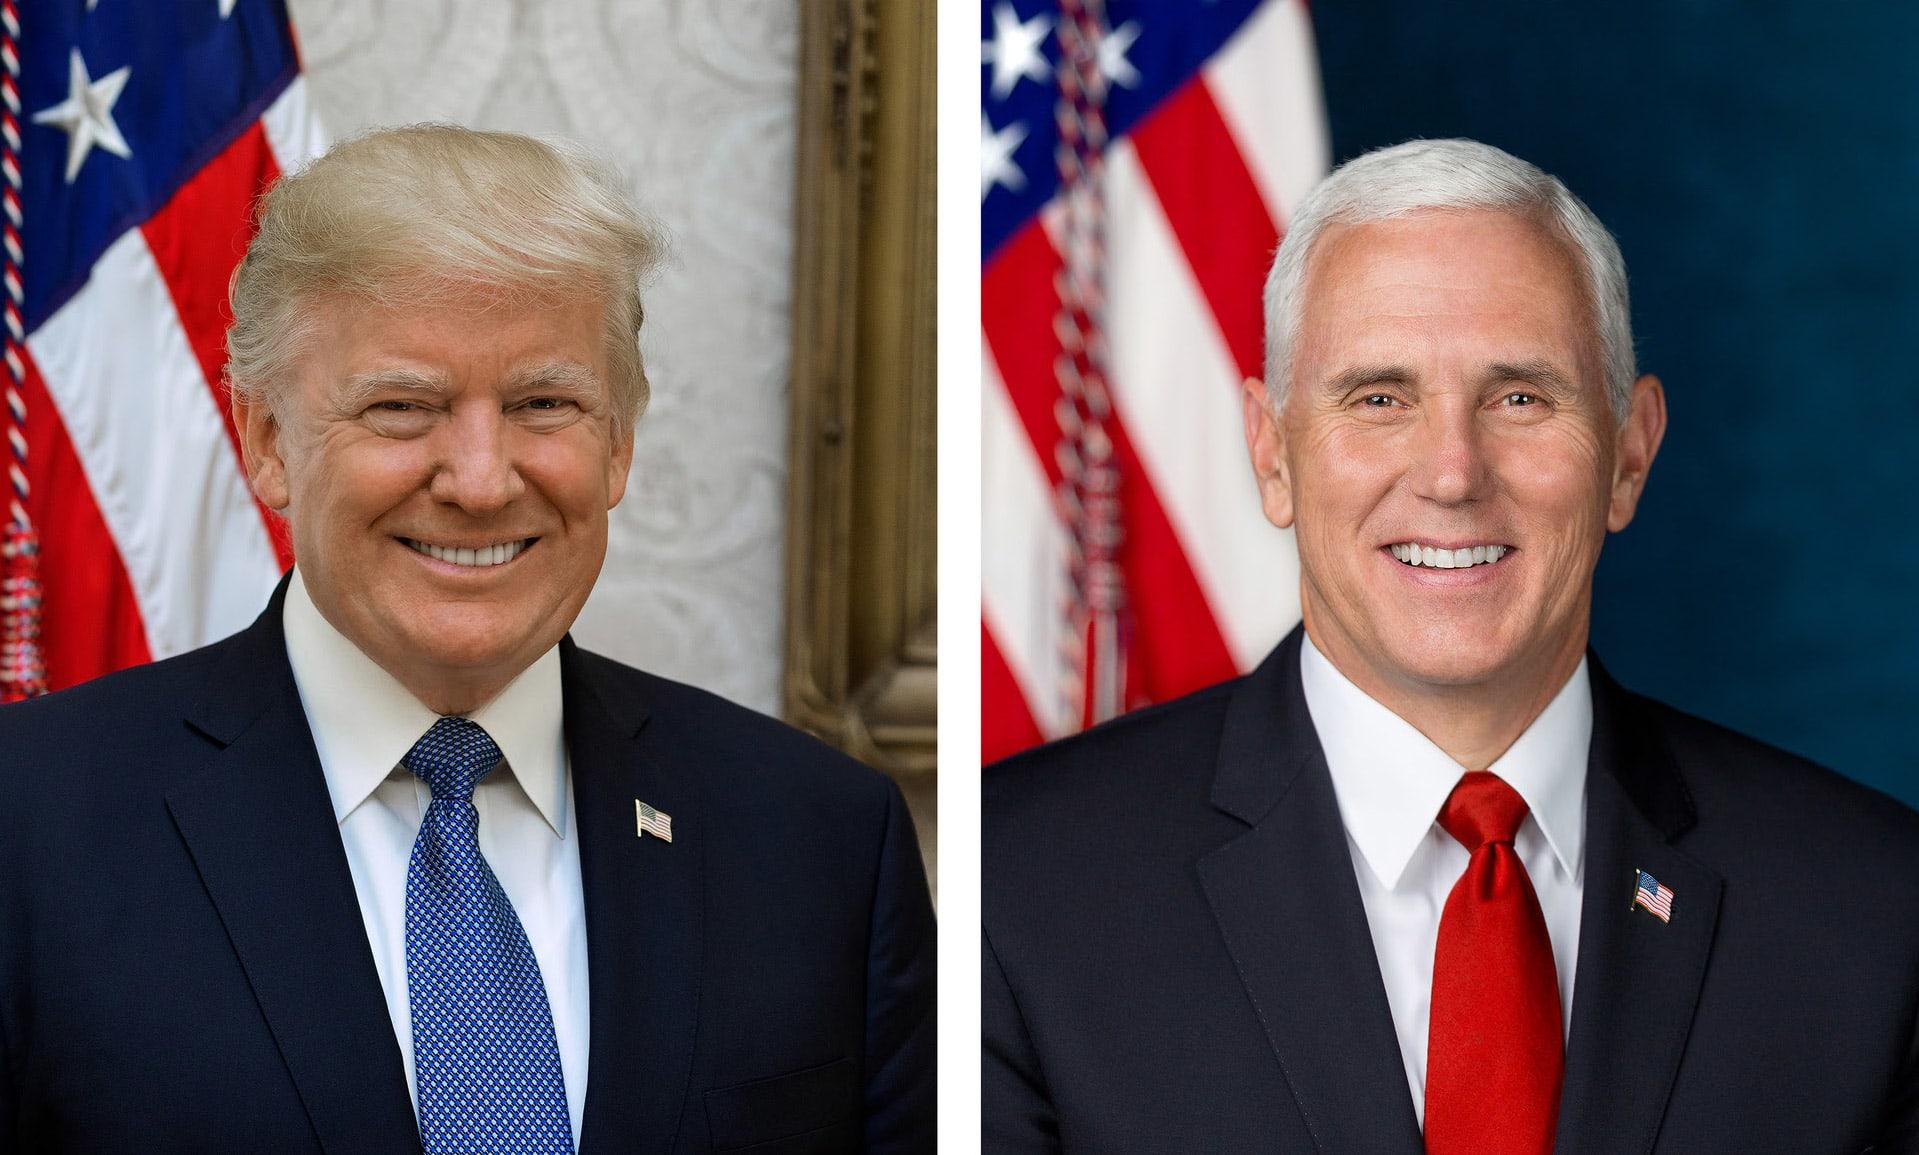 usrepublicanpartyrenominatesdonaldtrumpandmikepenceaspresidentialandvicepresidentialcandidates